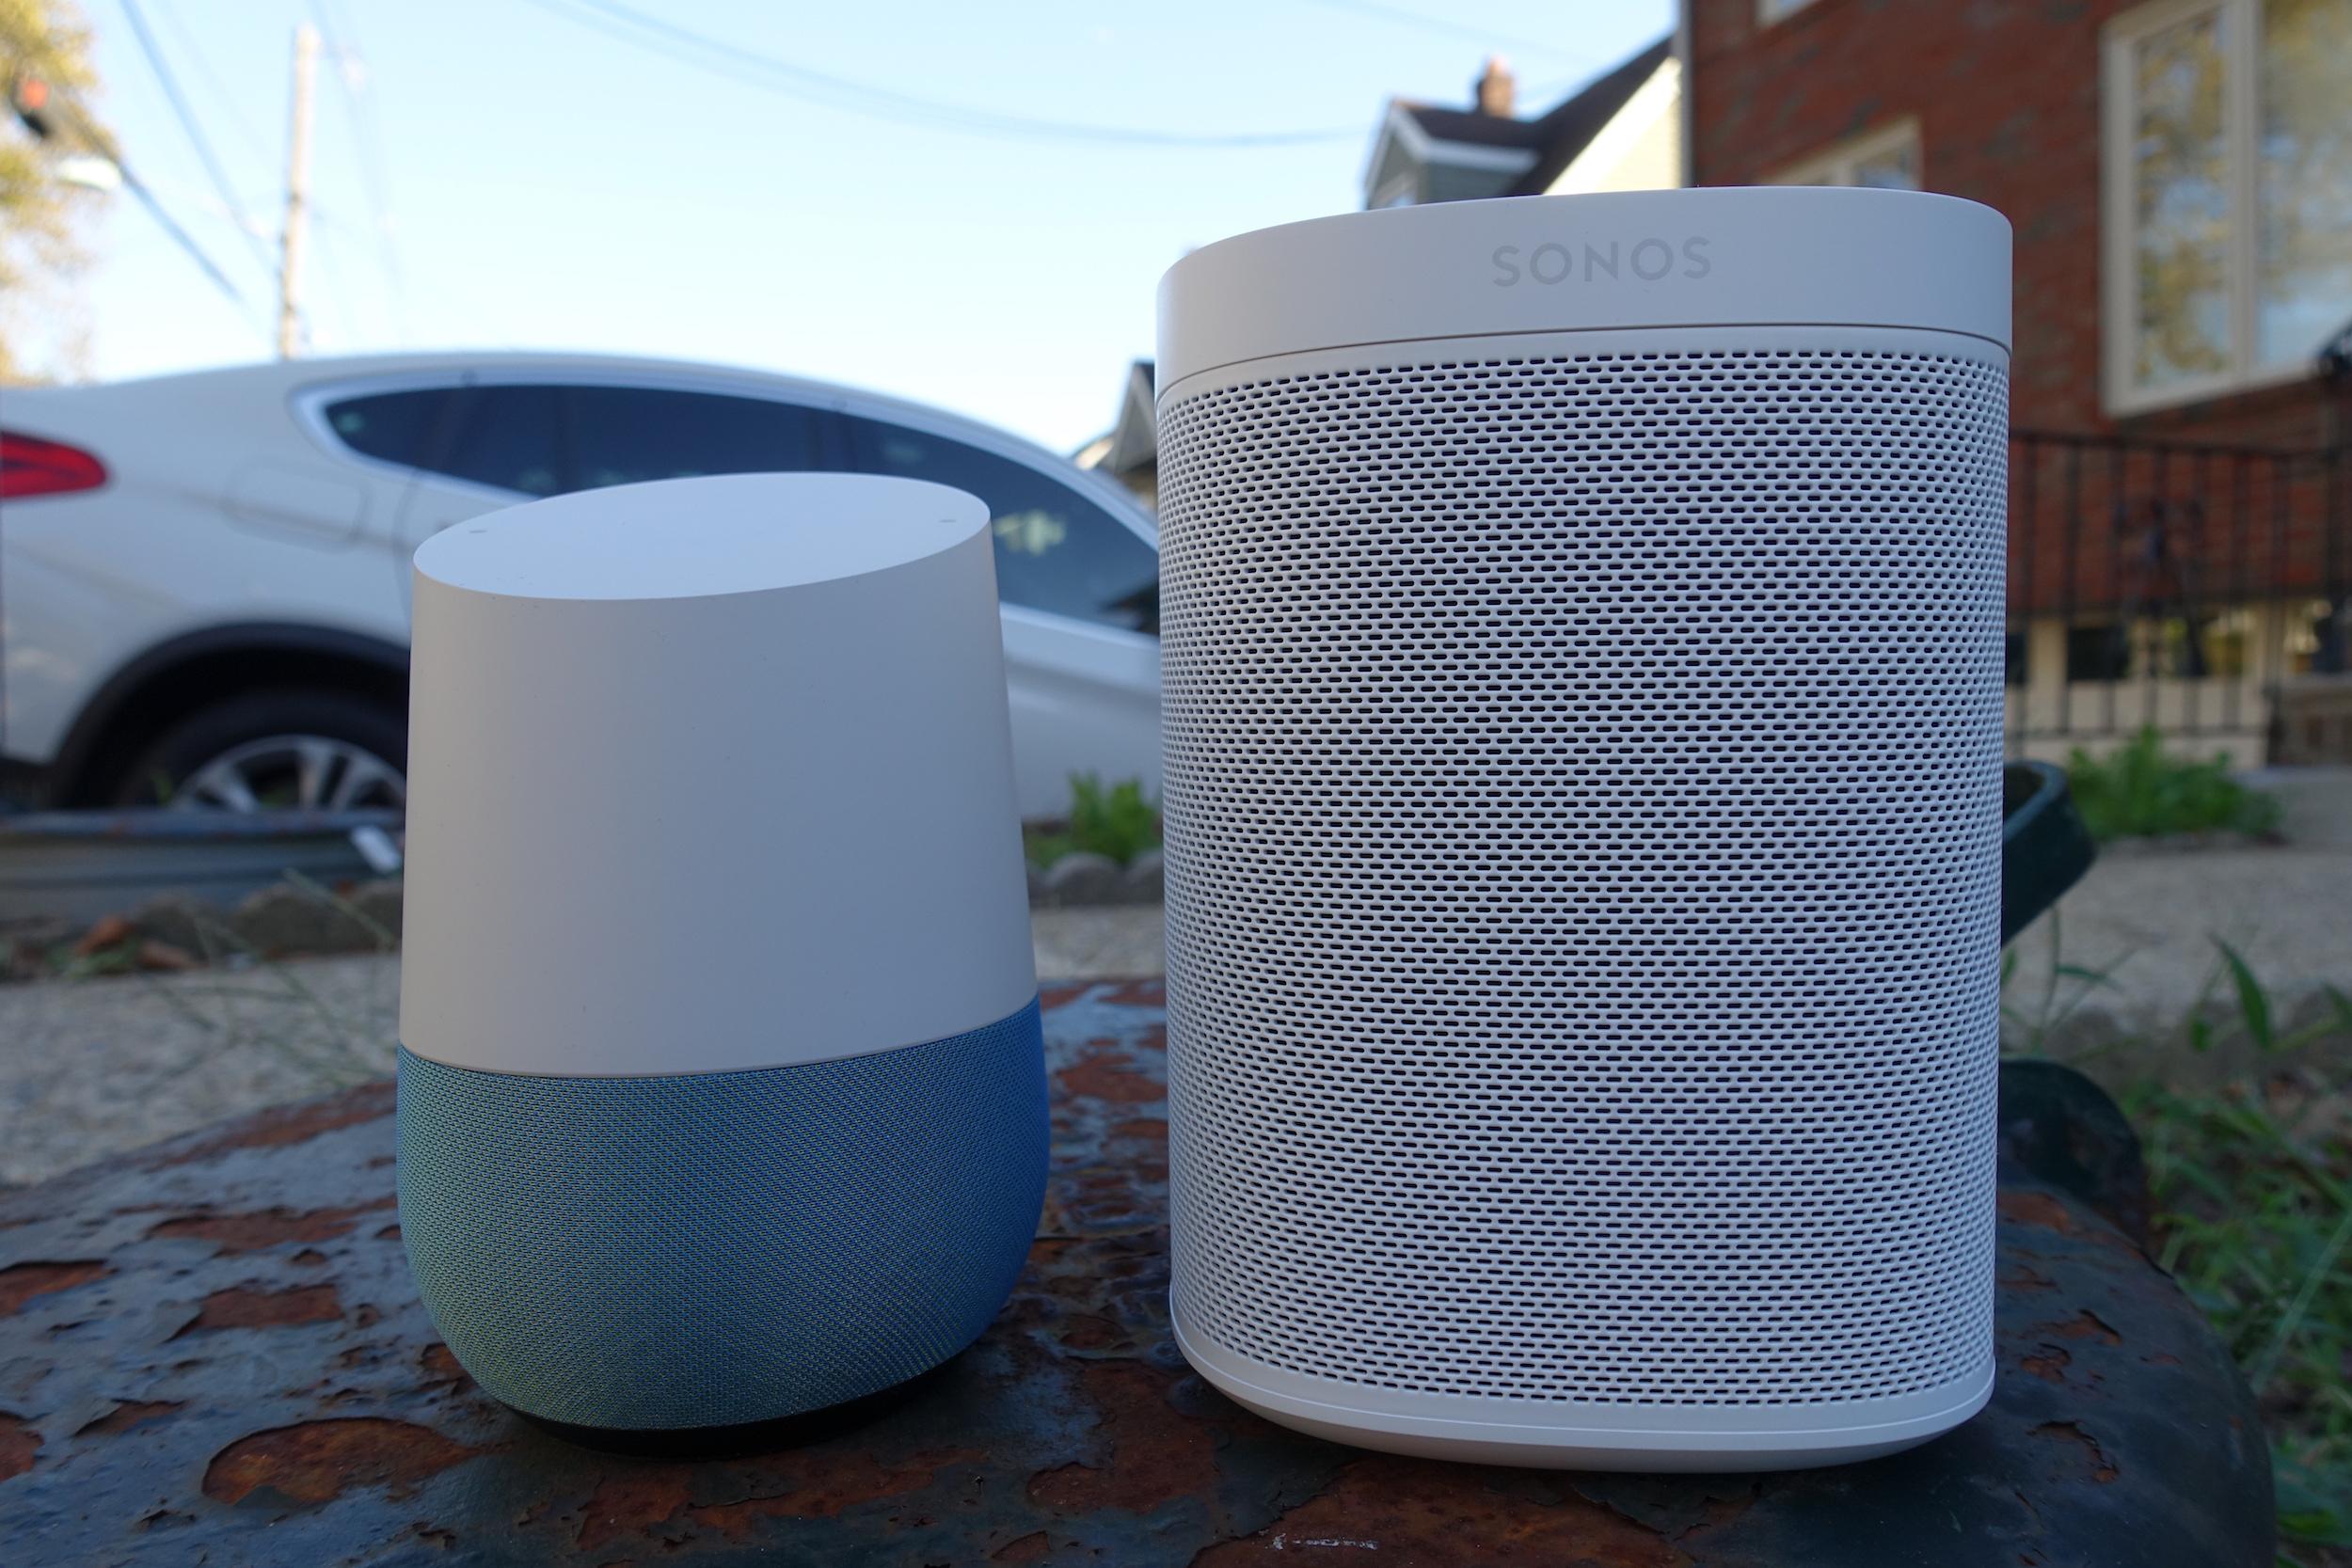 Sonos One review: A better sounding smart speaker | Ars Technica